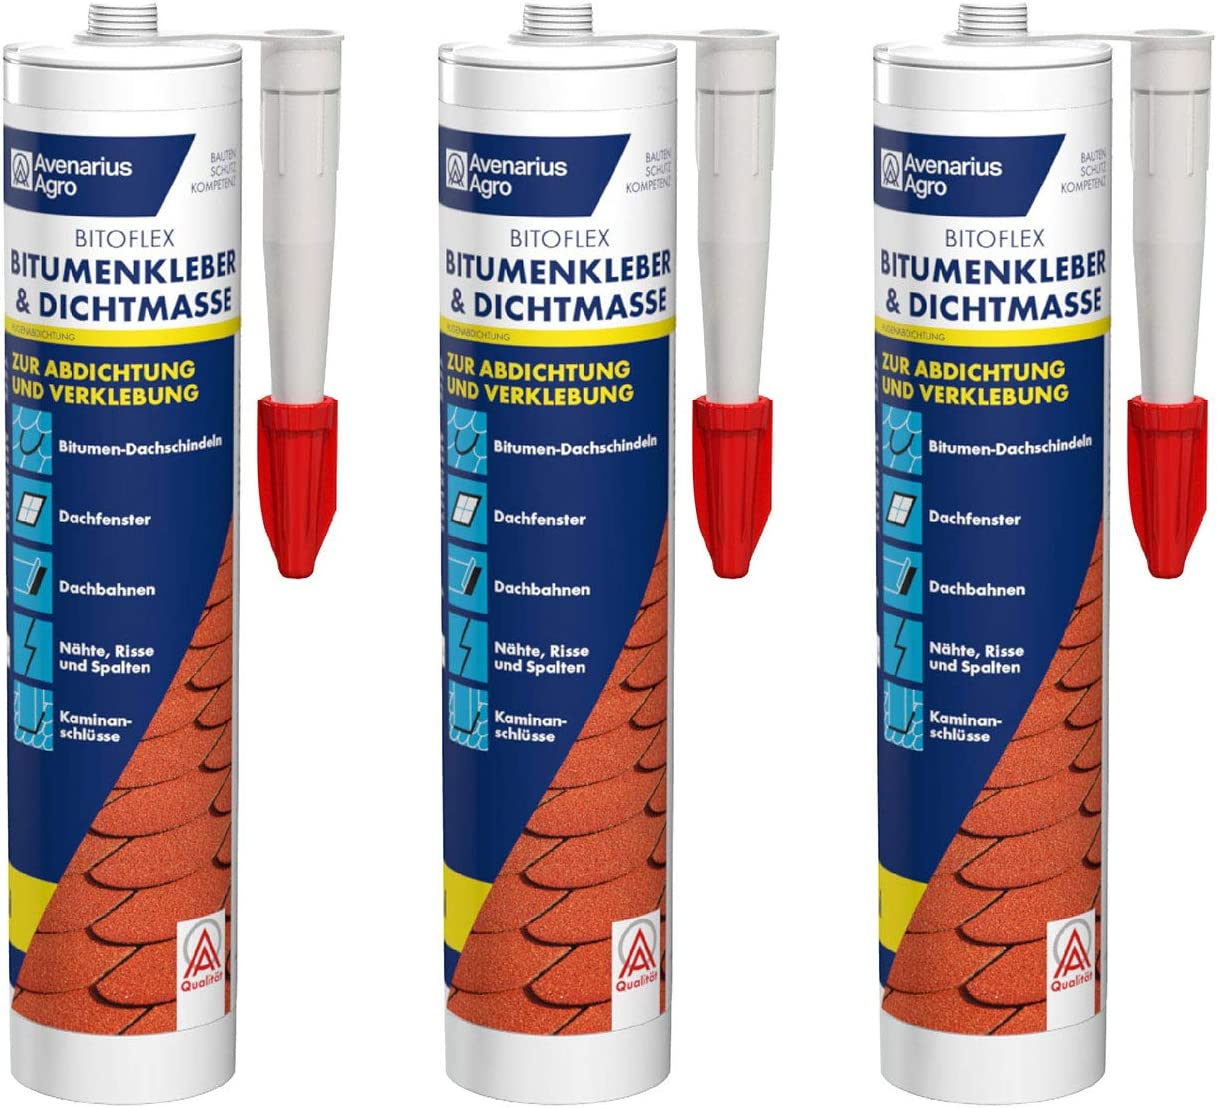 Avenarius Agro Bitoflex Bitumen-Kleber Dichtmasse 15 ml (15 Stück